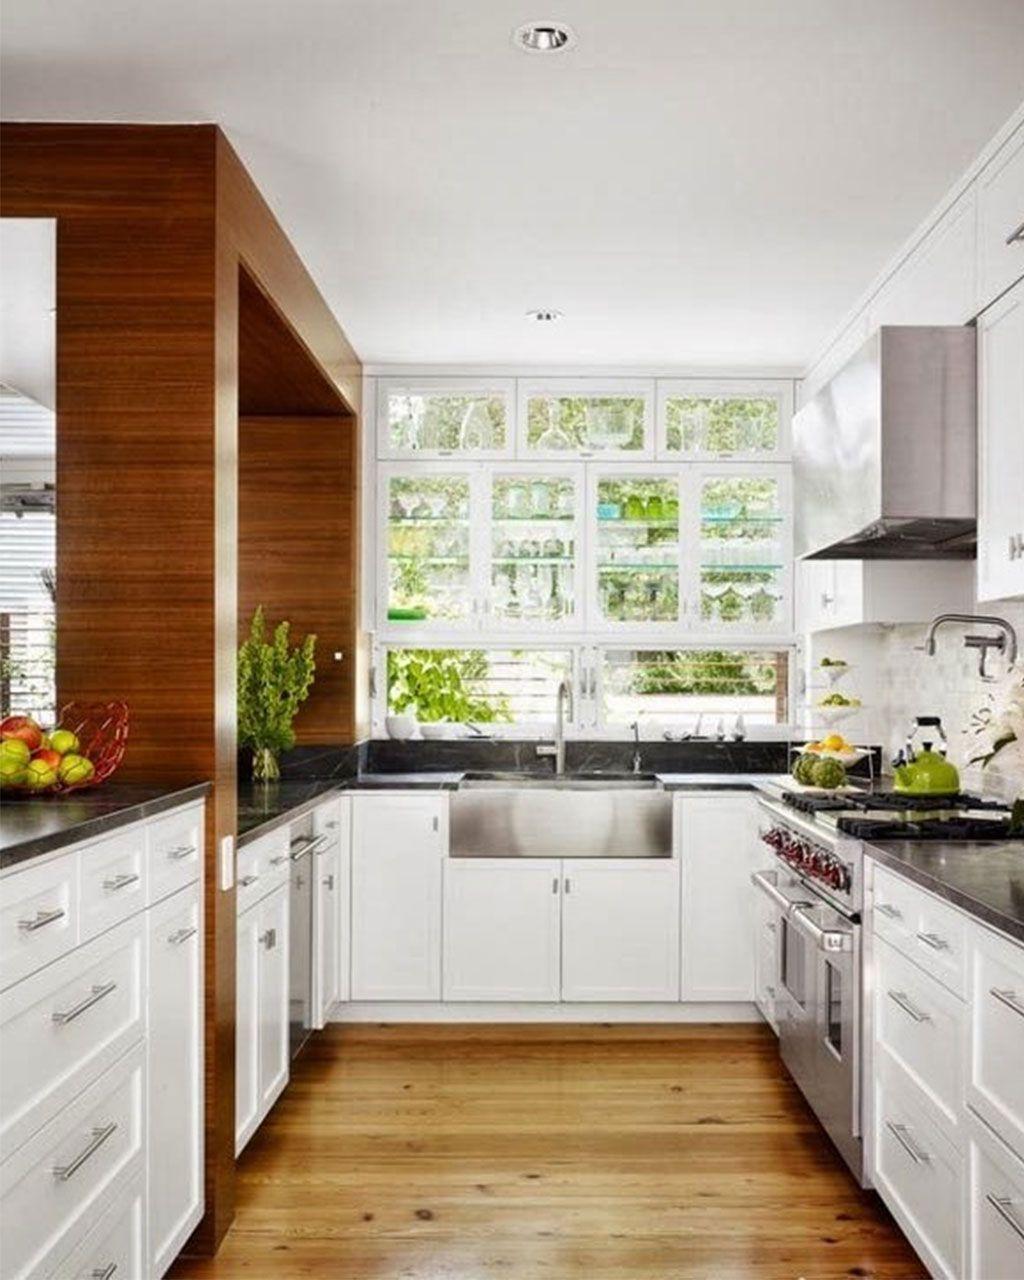 Top Kitchen Design Ideas 2 Image  Apartment  Pinterest  Kitchen Delectable Best Small Kitchen Designs 2018